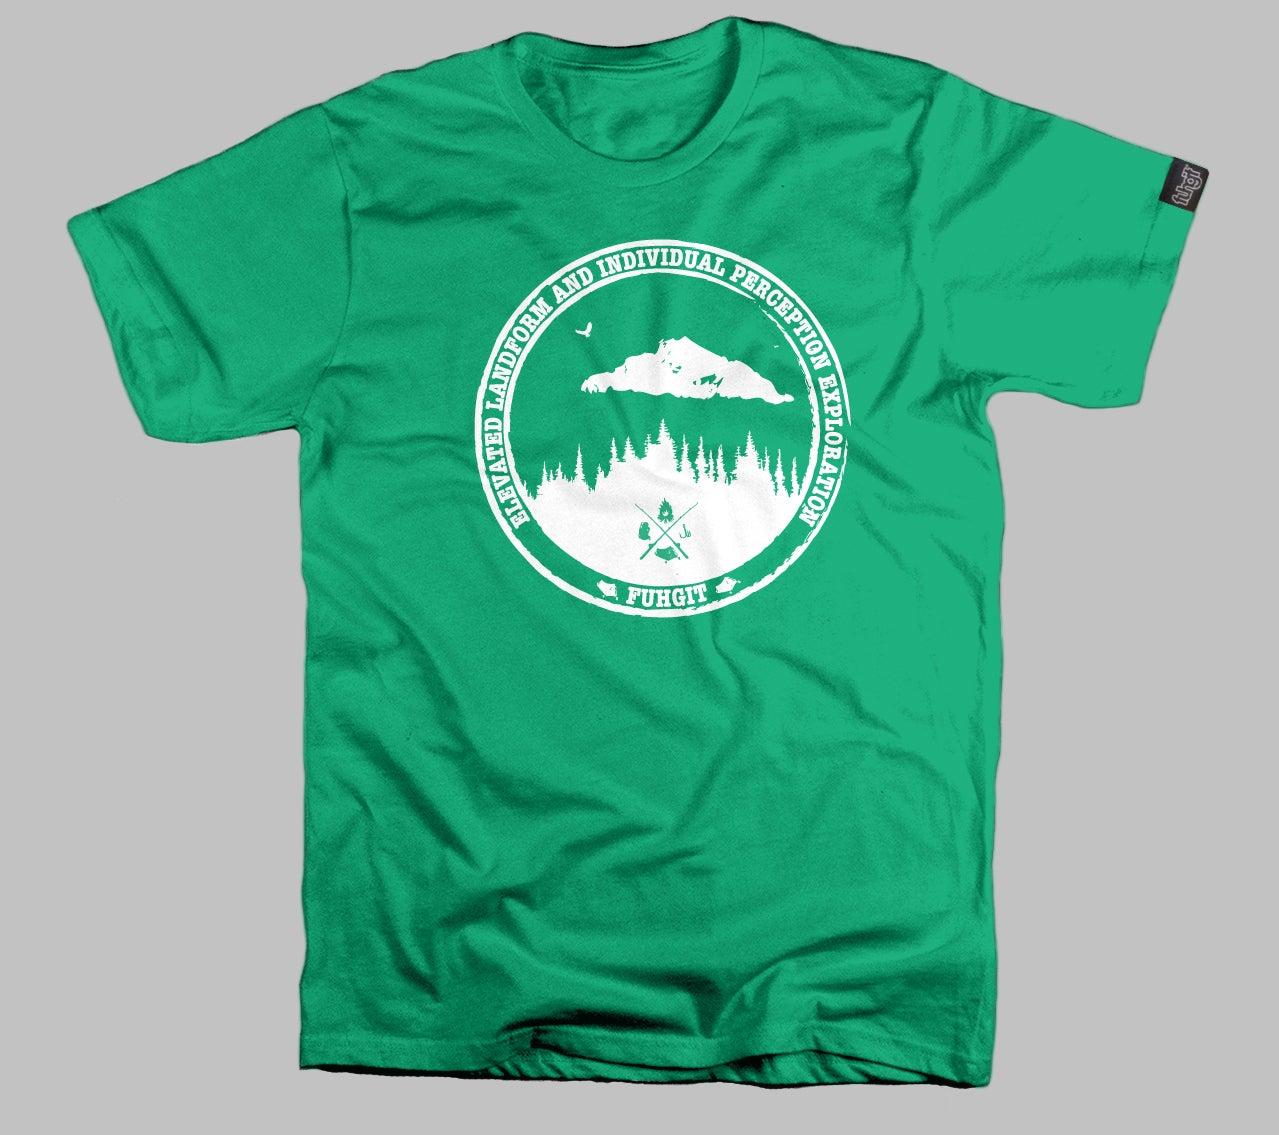 Image of Landform T shirt